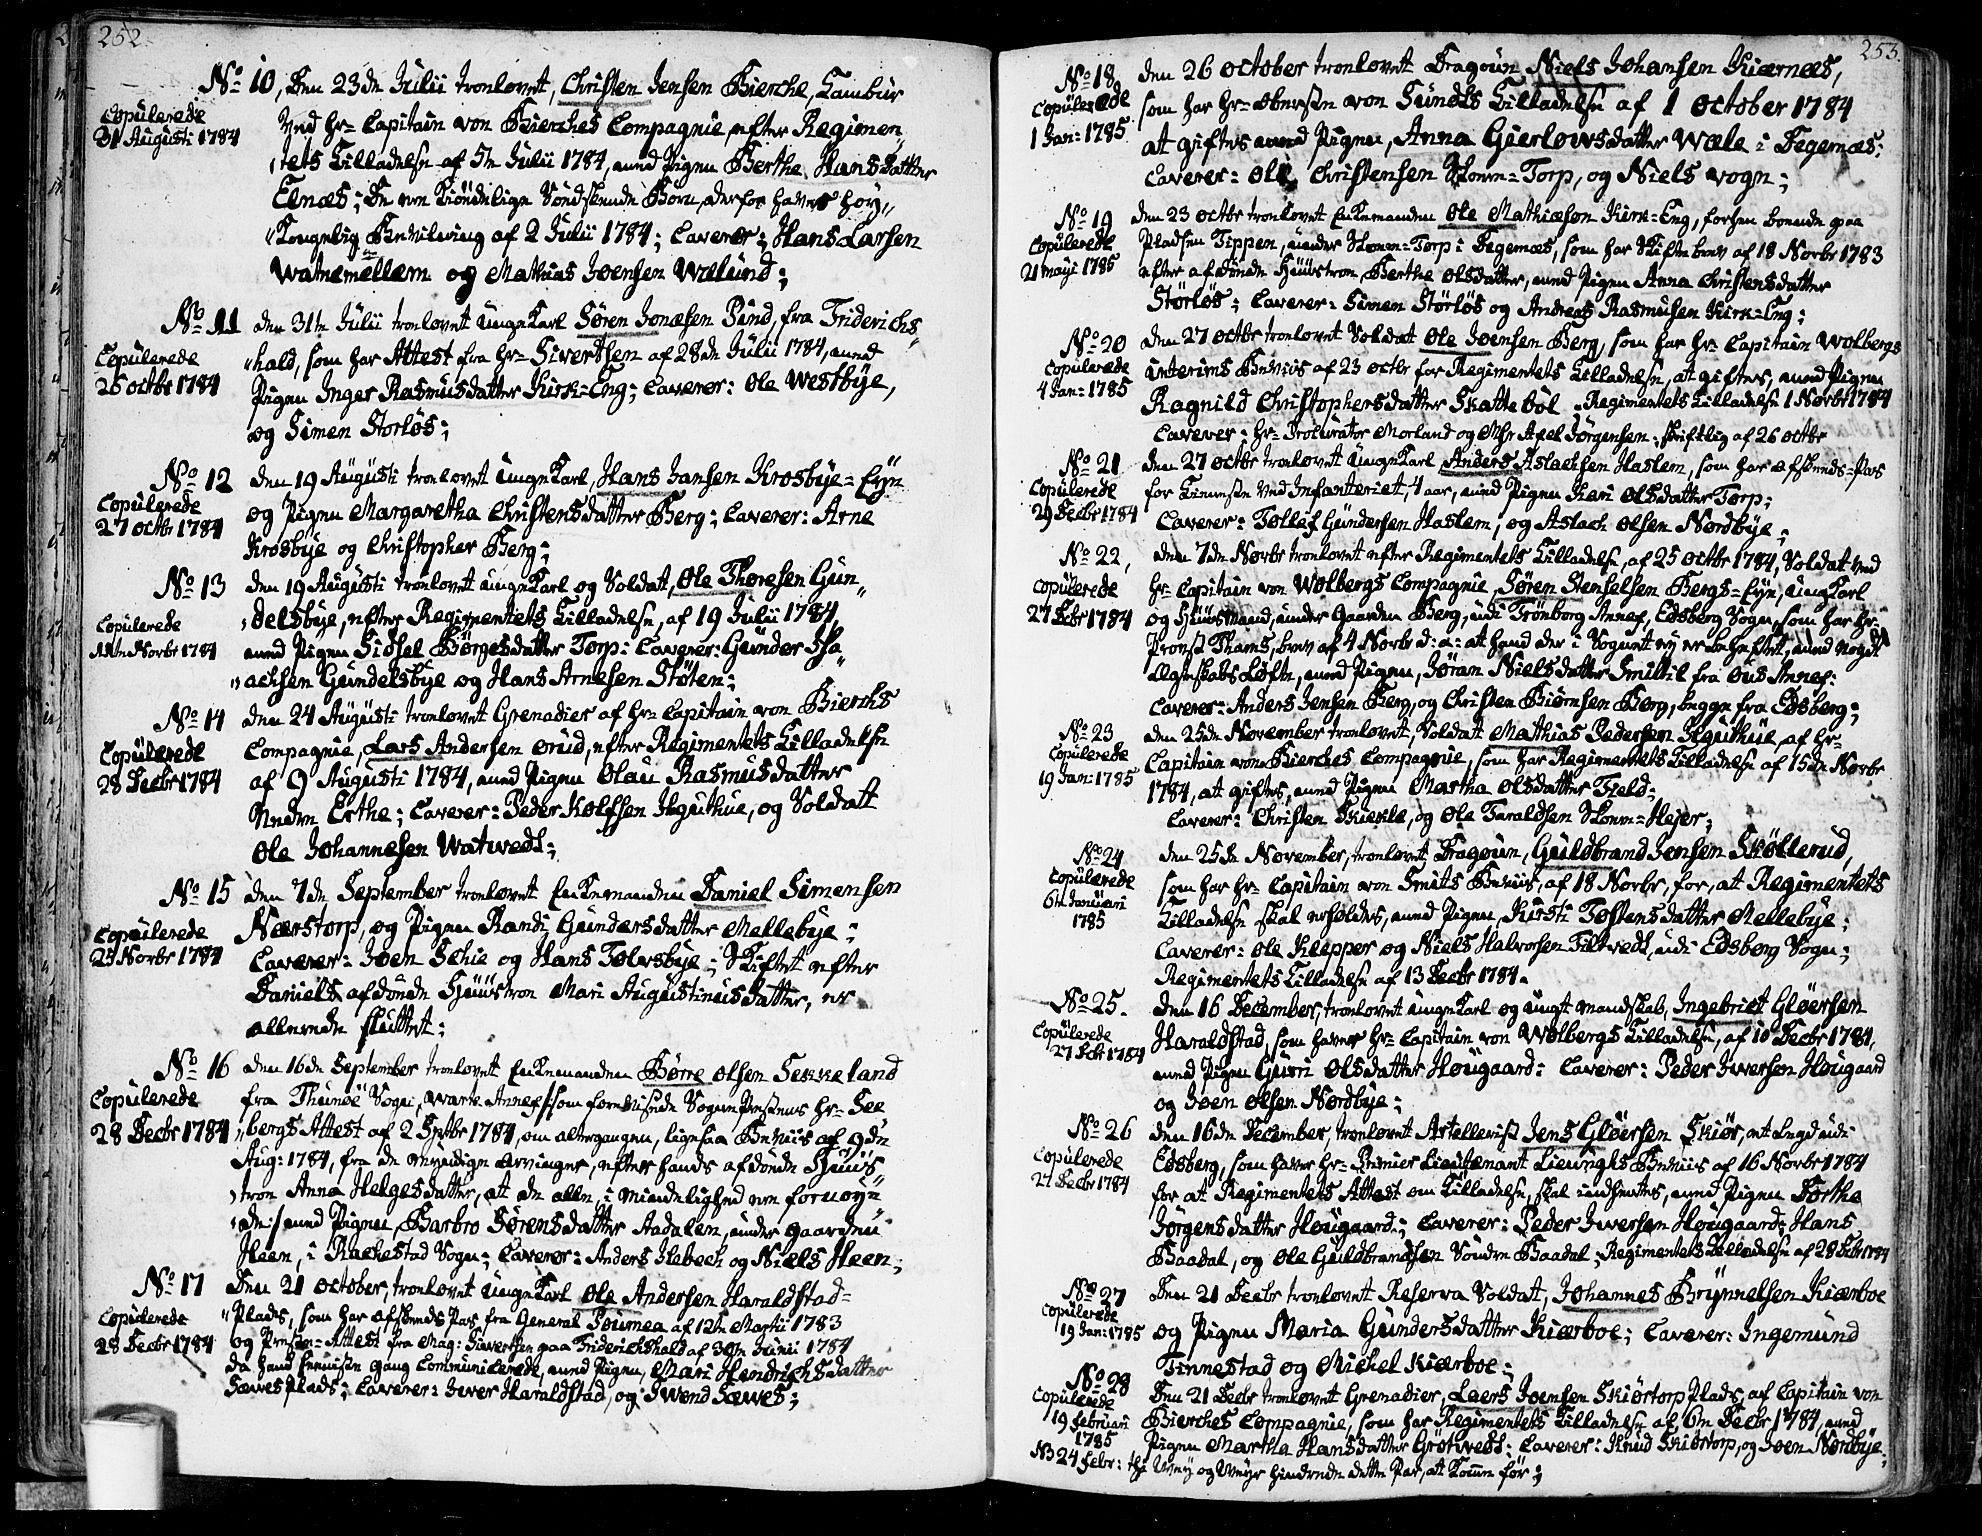 SAO, Rakkestad prestekontor Kirkebøker, F/Fa/L0005: Ministerialbok nr. I 5, 1784-1814, s. 252-253